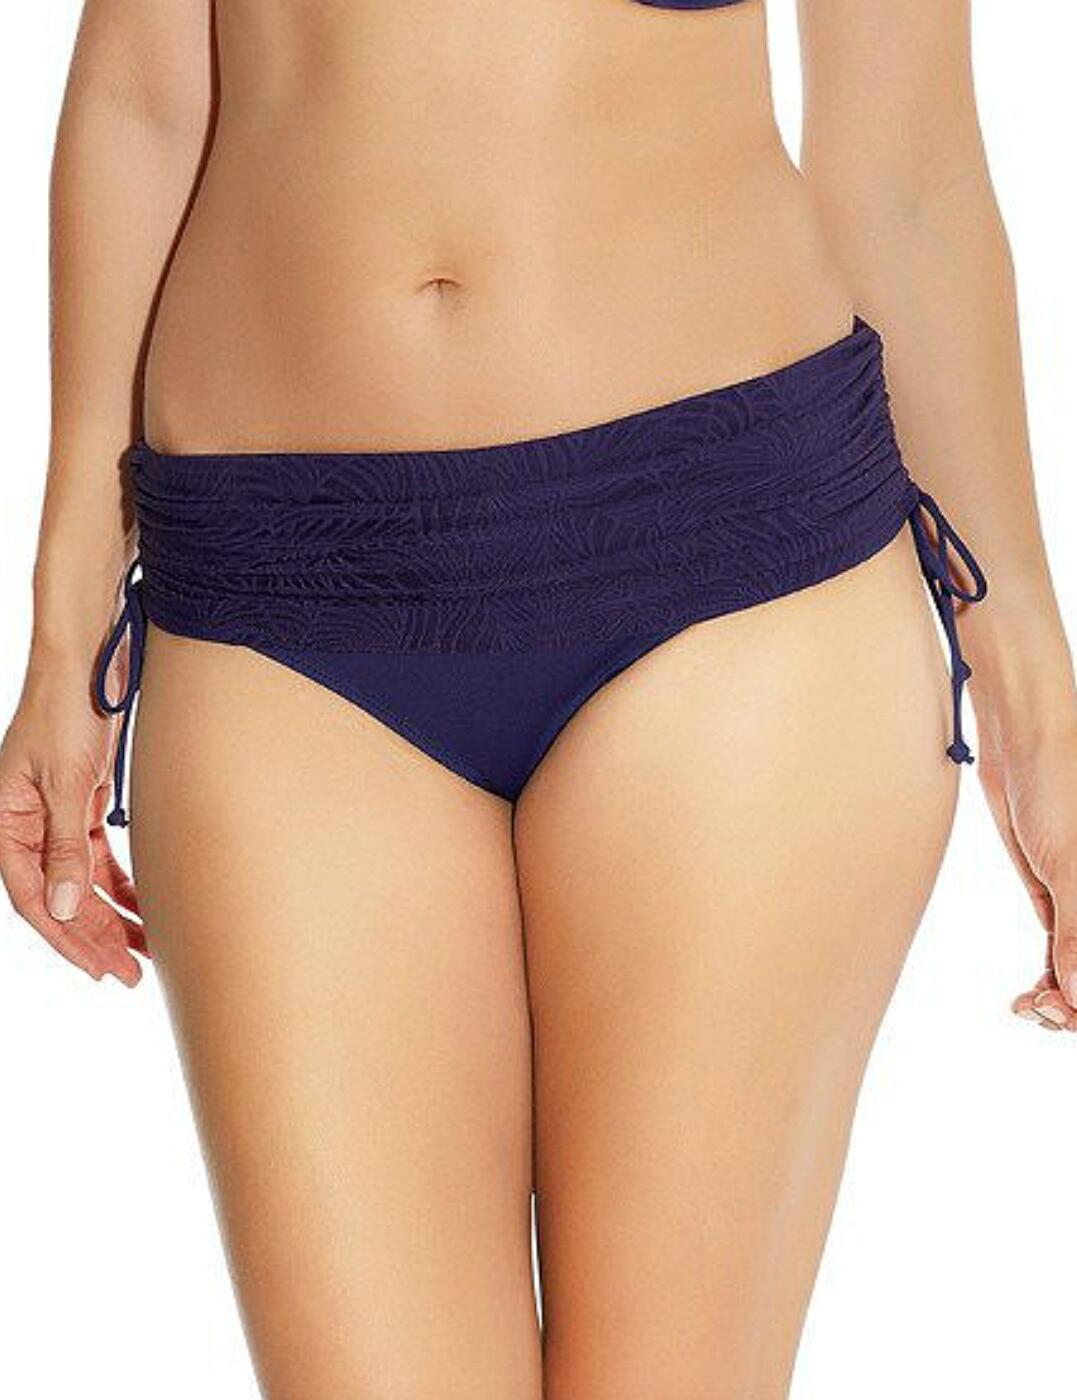 5435 Fantasie Montreal Adjustable Fold Bikini Brief - 5435 Indigo